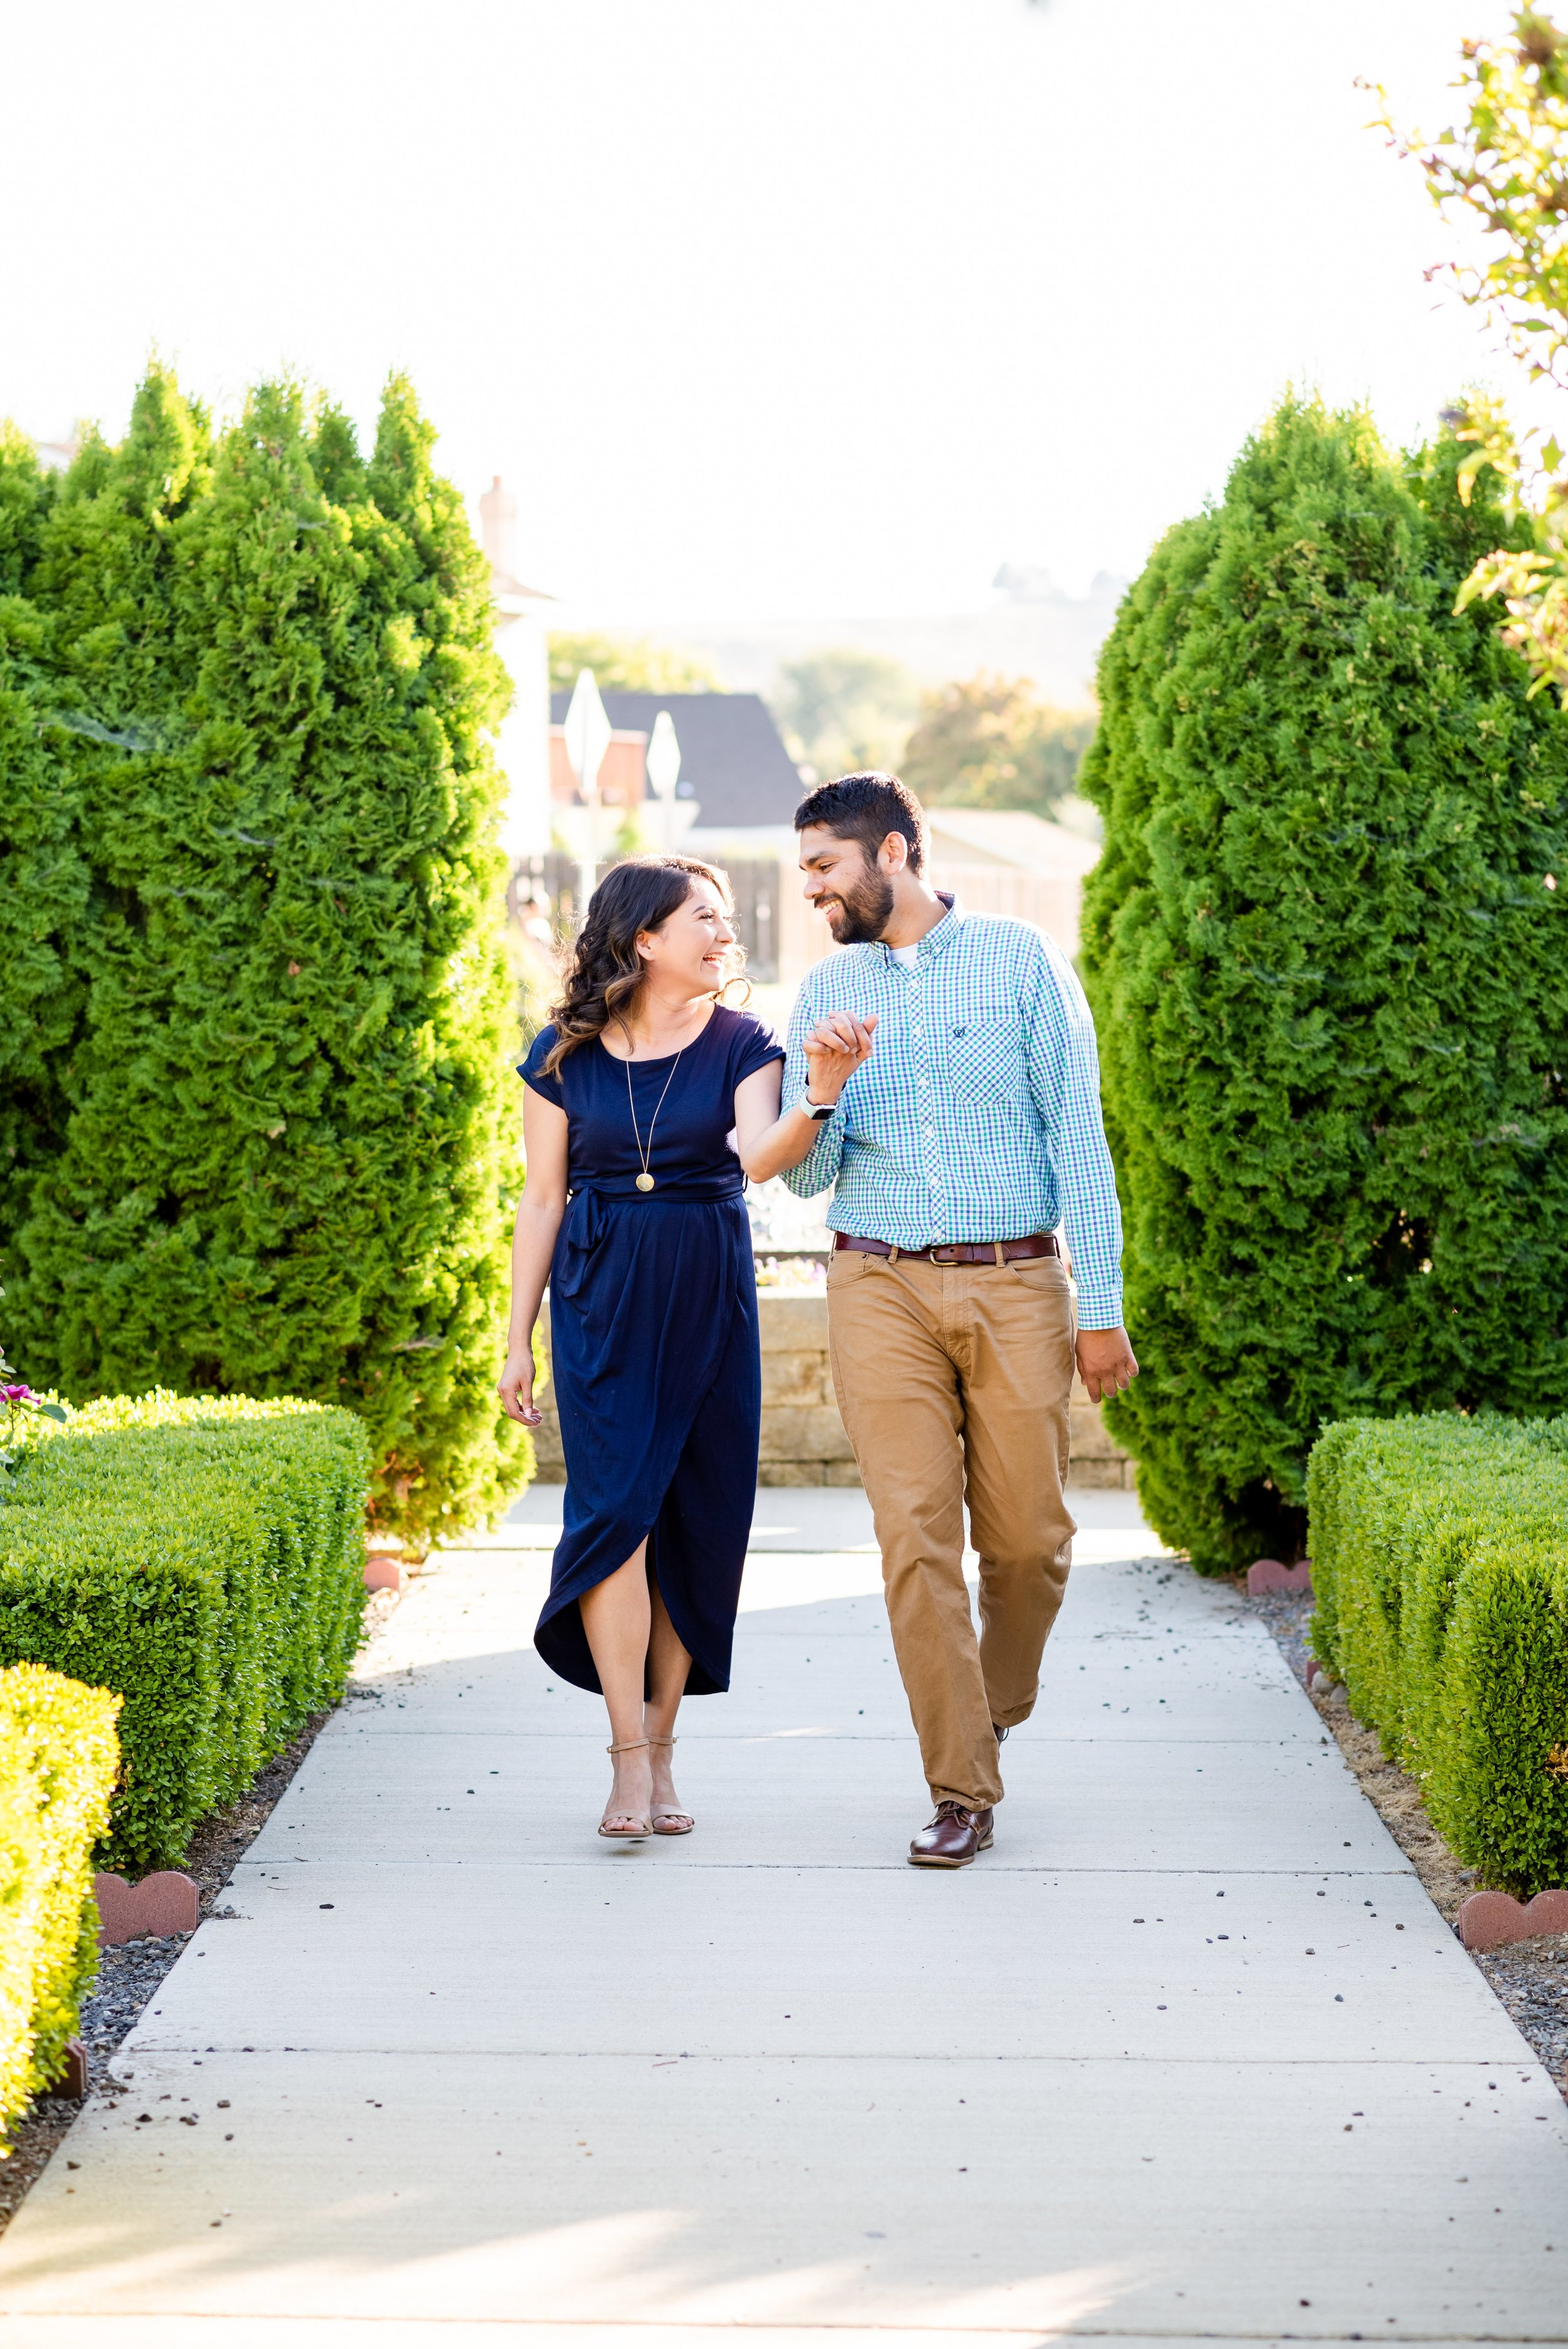 Kennewick Washington Engagement Photos - Morgan Tayler Photo & Design - Tri Cities Wa Engagement Photographer_0003.jpg